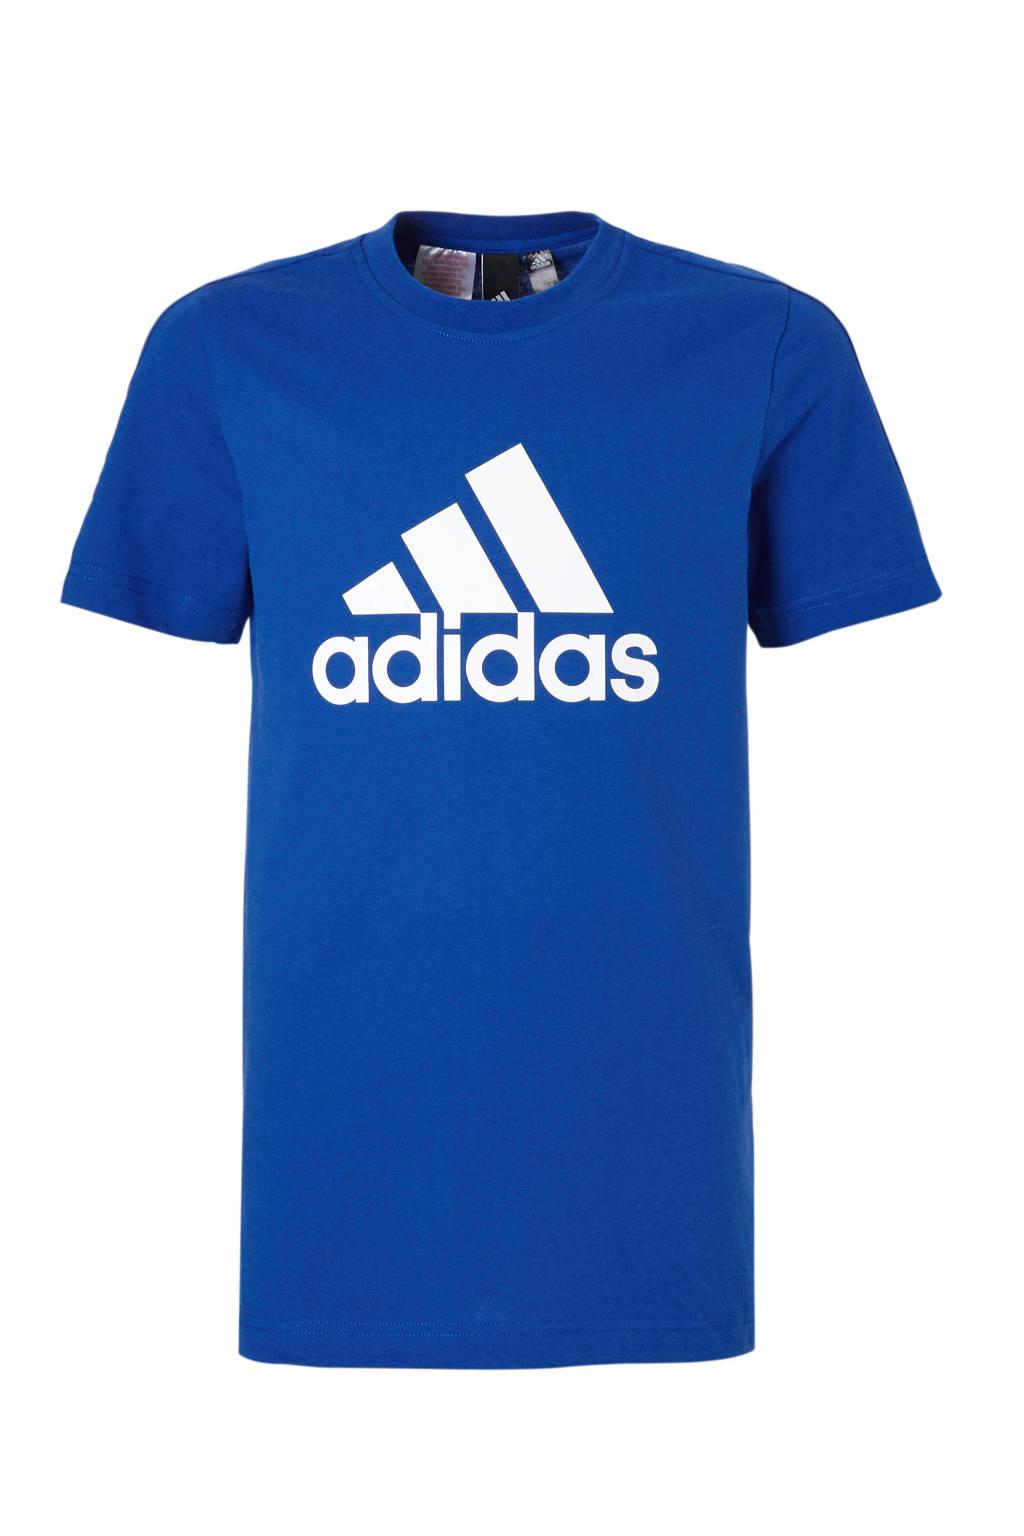 adidas performance   T-shirt, Donkerblauw/wit